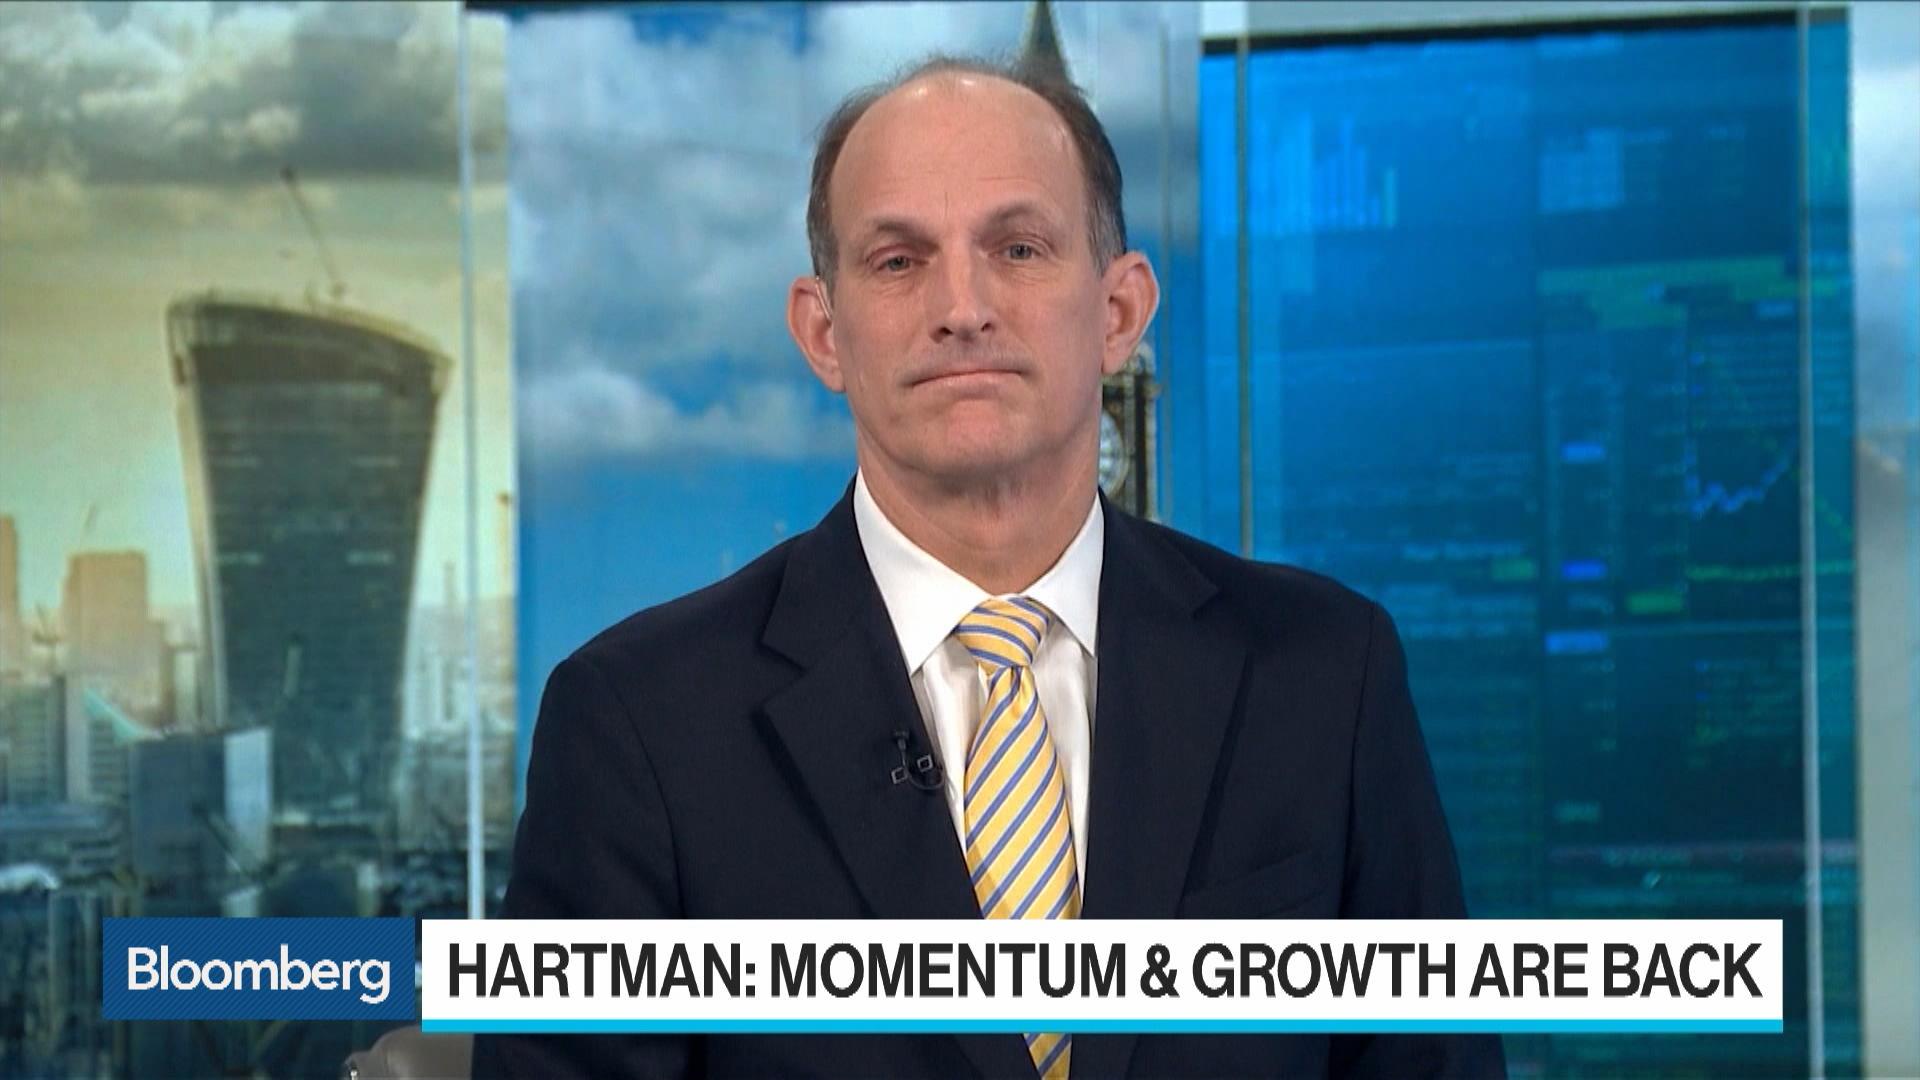 Markets May Go Up Another 5%, Wells Fargo Asset's Hartman Says